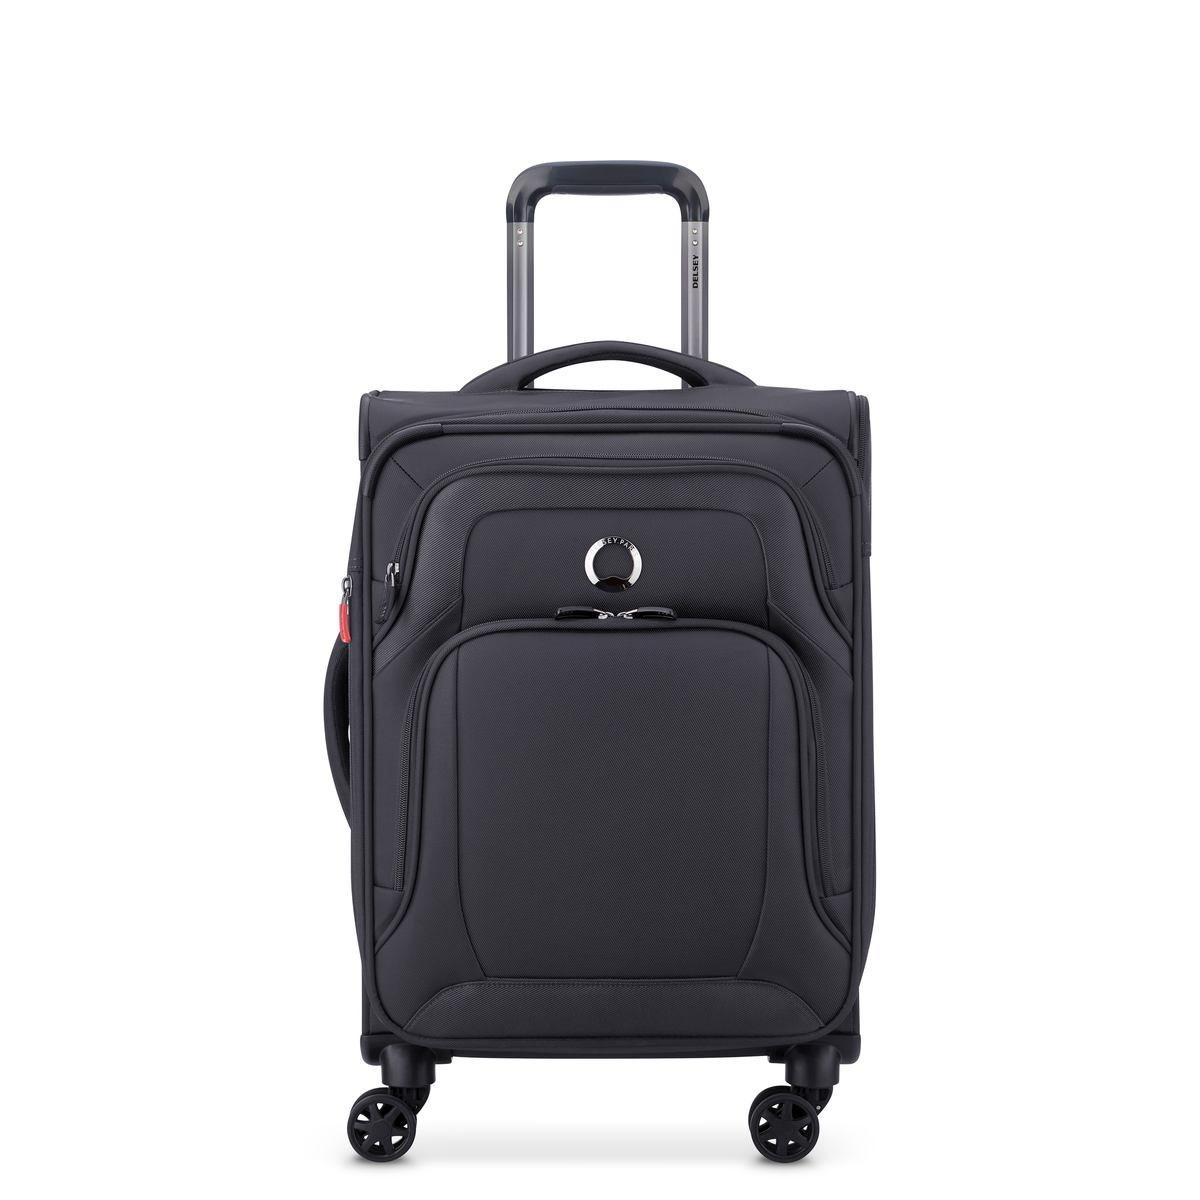 Delsey Βαλίτσα καμπίνας expandable 55x36.5x24/26cm σειρά Optimax Black